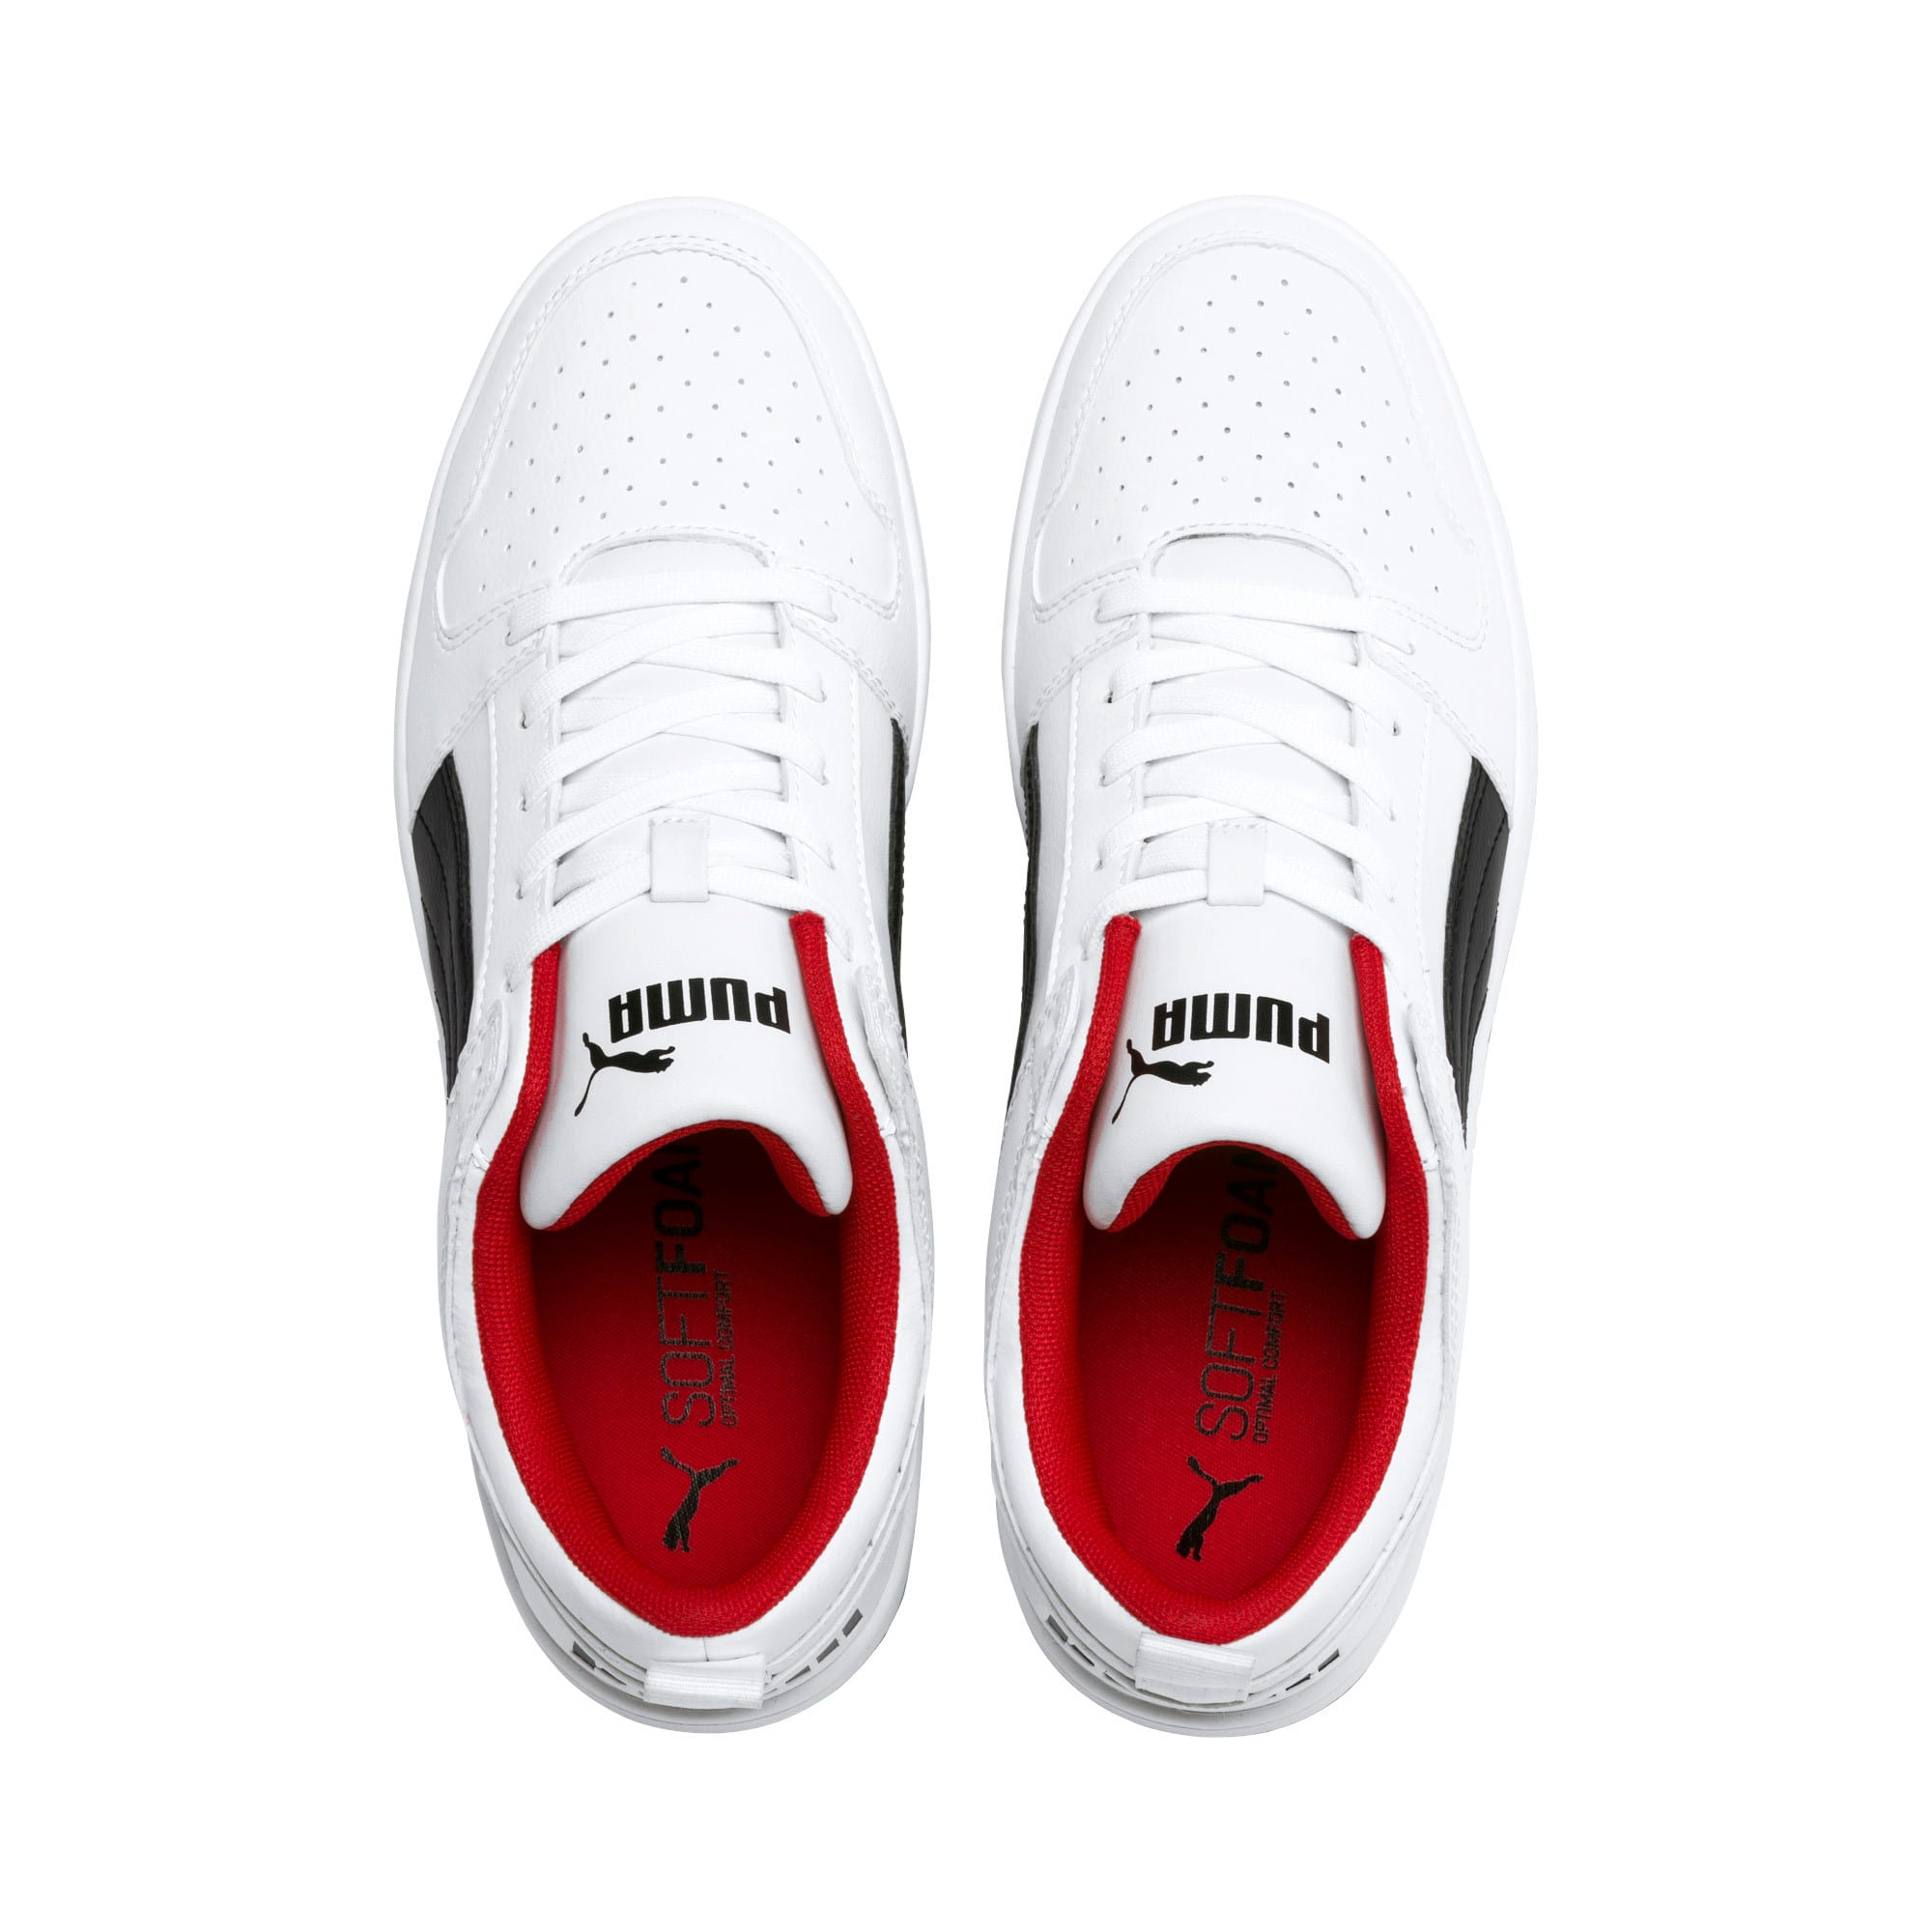 Miniatura 7 de Zapatos deportivos PUMA Rebound LayUp Lo, White-Black-High Risk Red, mediano